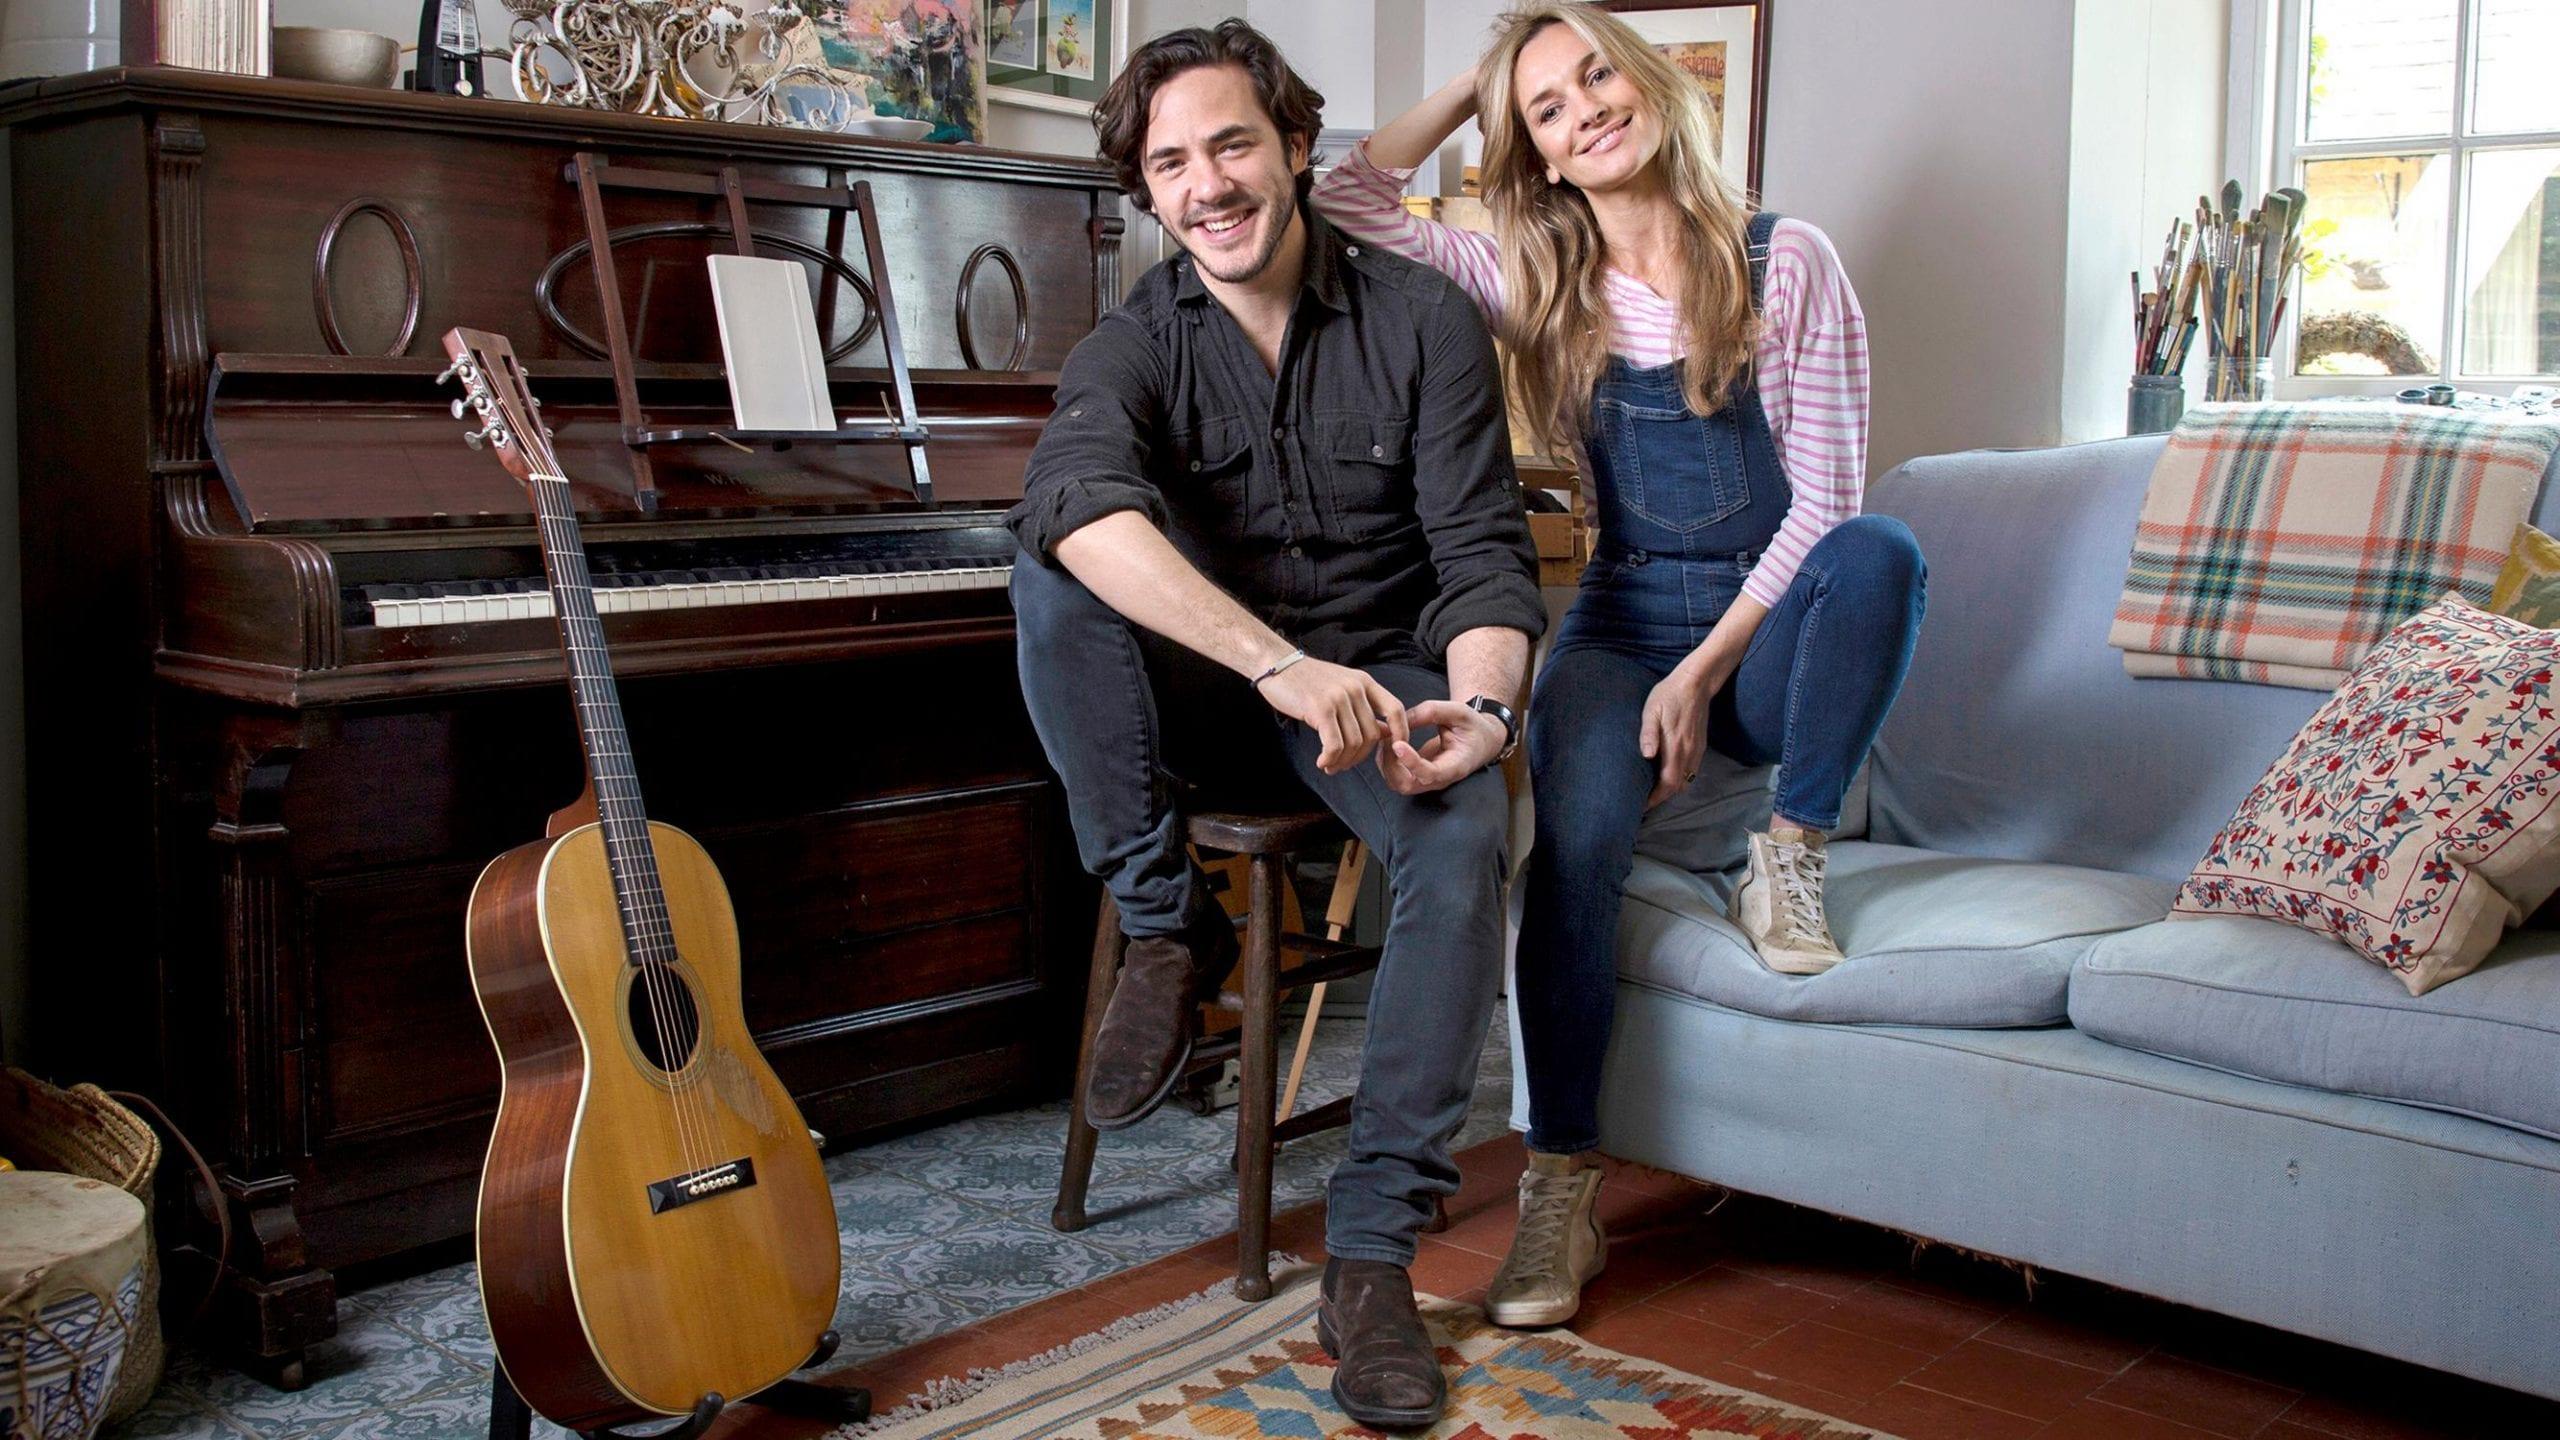 Jemma Powell and Jack Savoretti